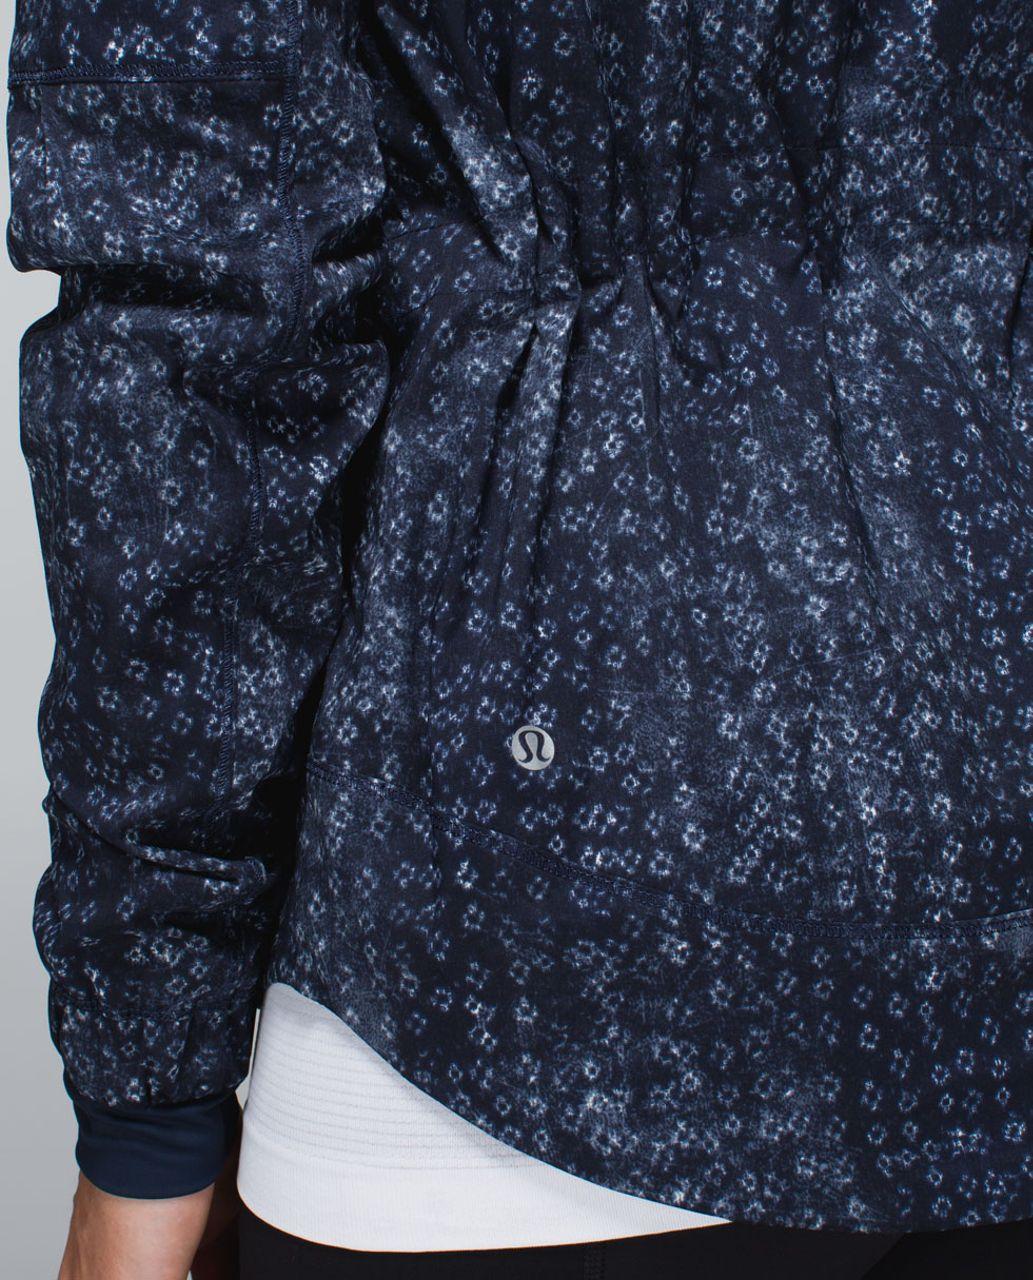 Lululemon Spring Forward Jacket - Kanoko Twist Inkwell Ghost / Inkwell